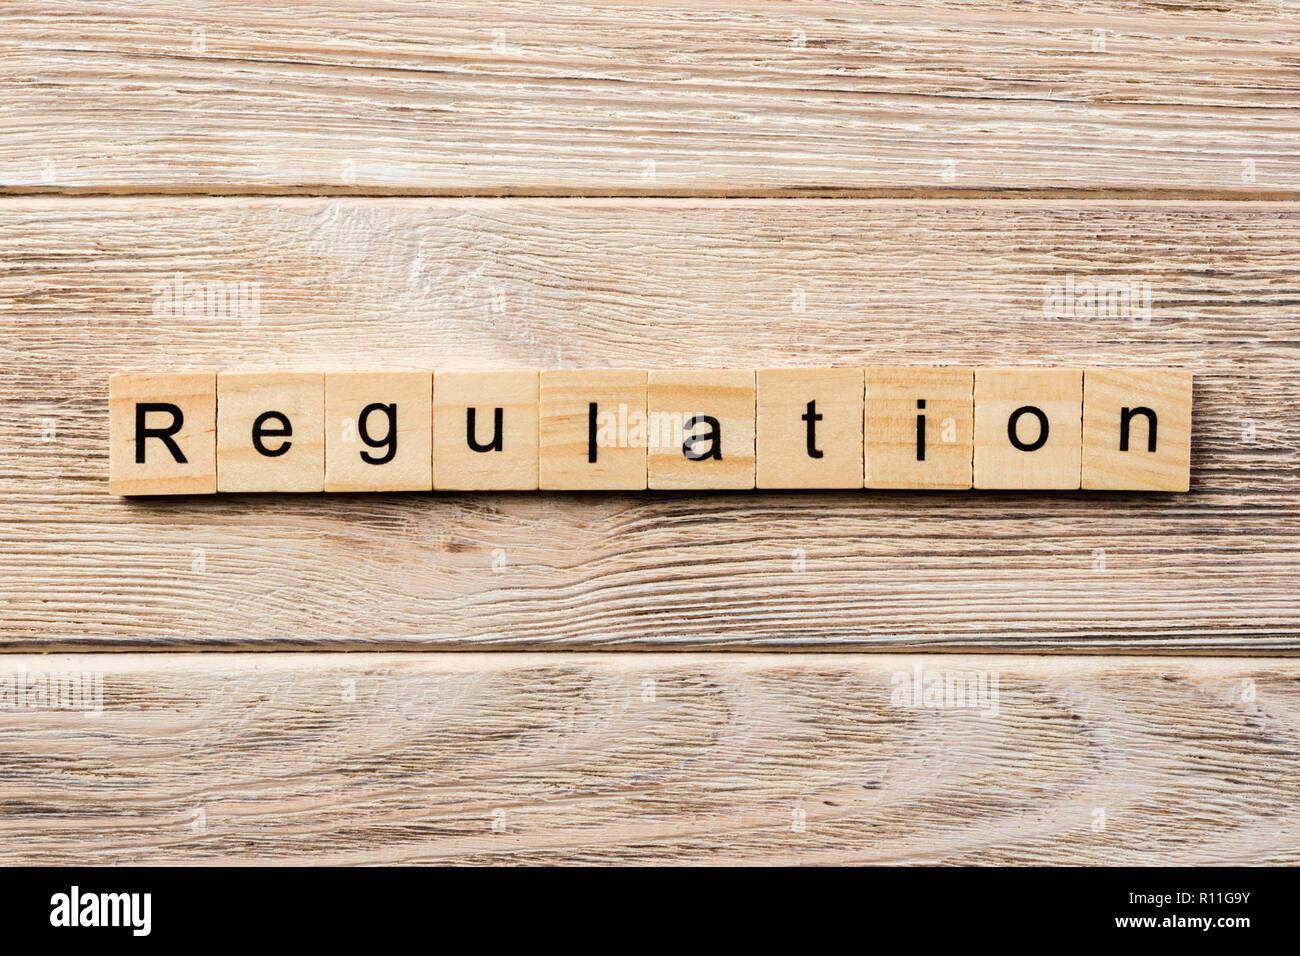 regulation word written on wood block. regulation text on table, concept. - Stock Image